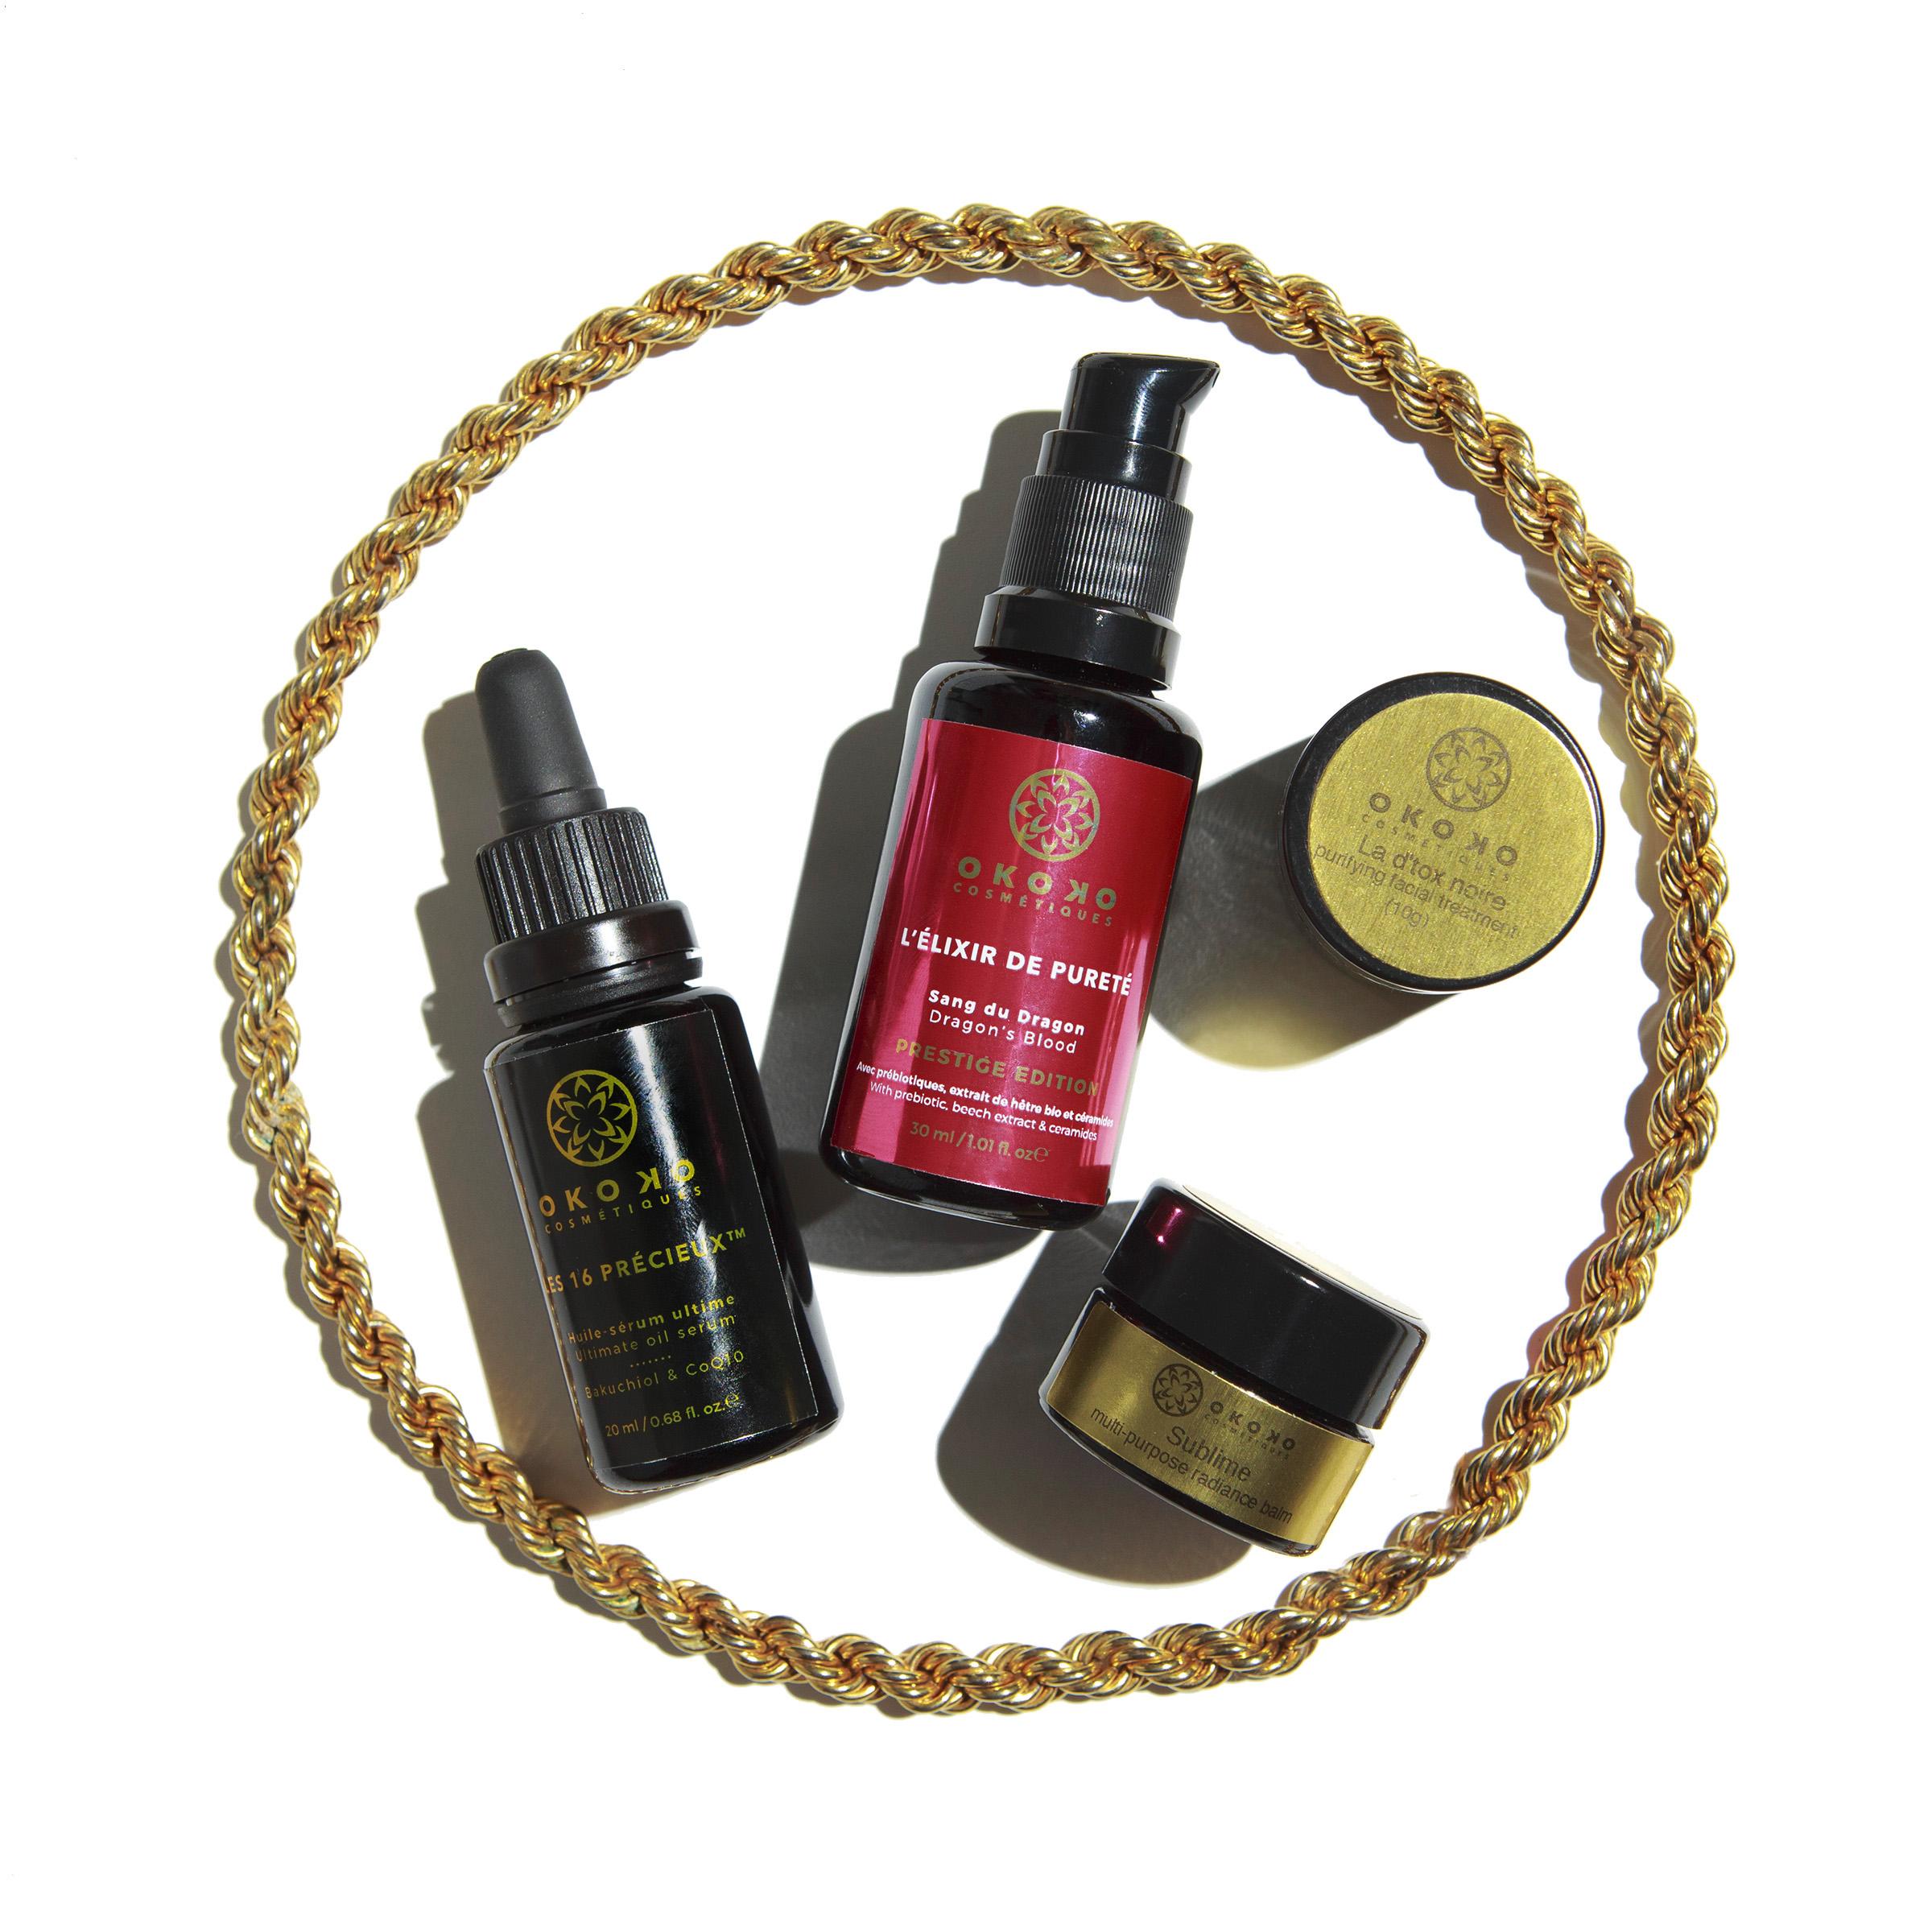 Okoko Cosmetique Products